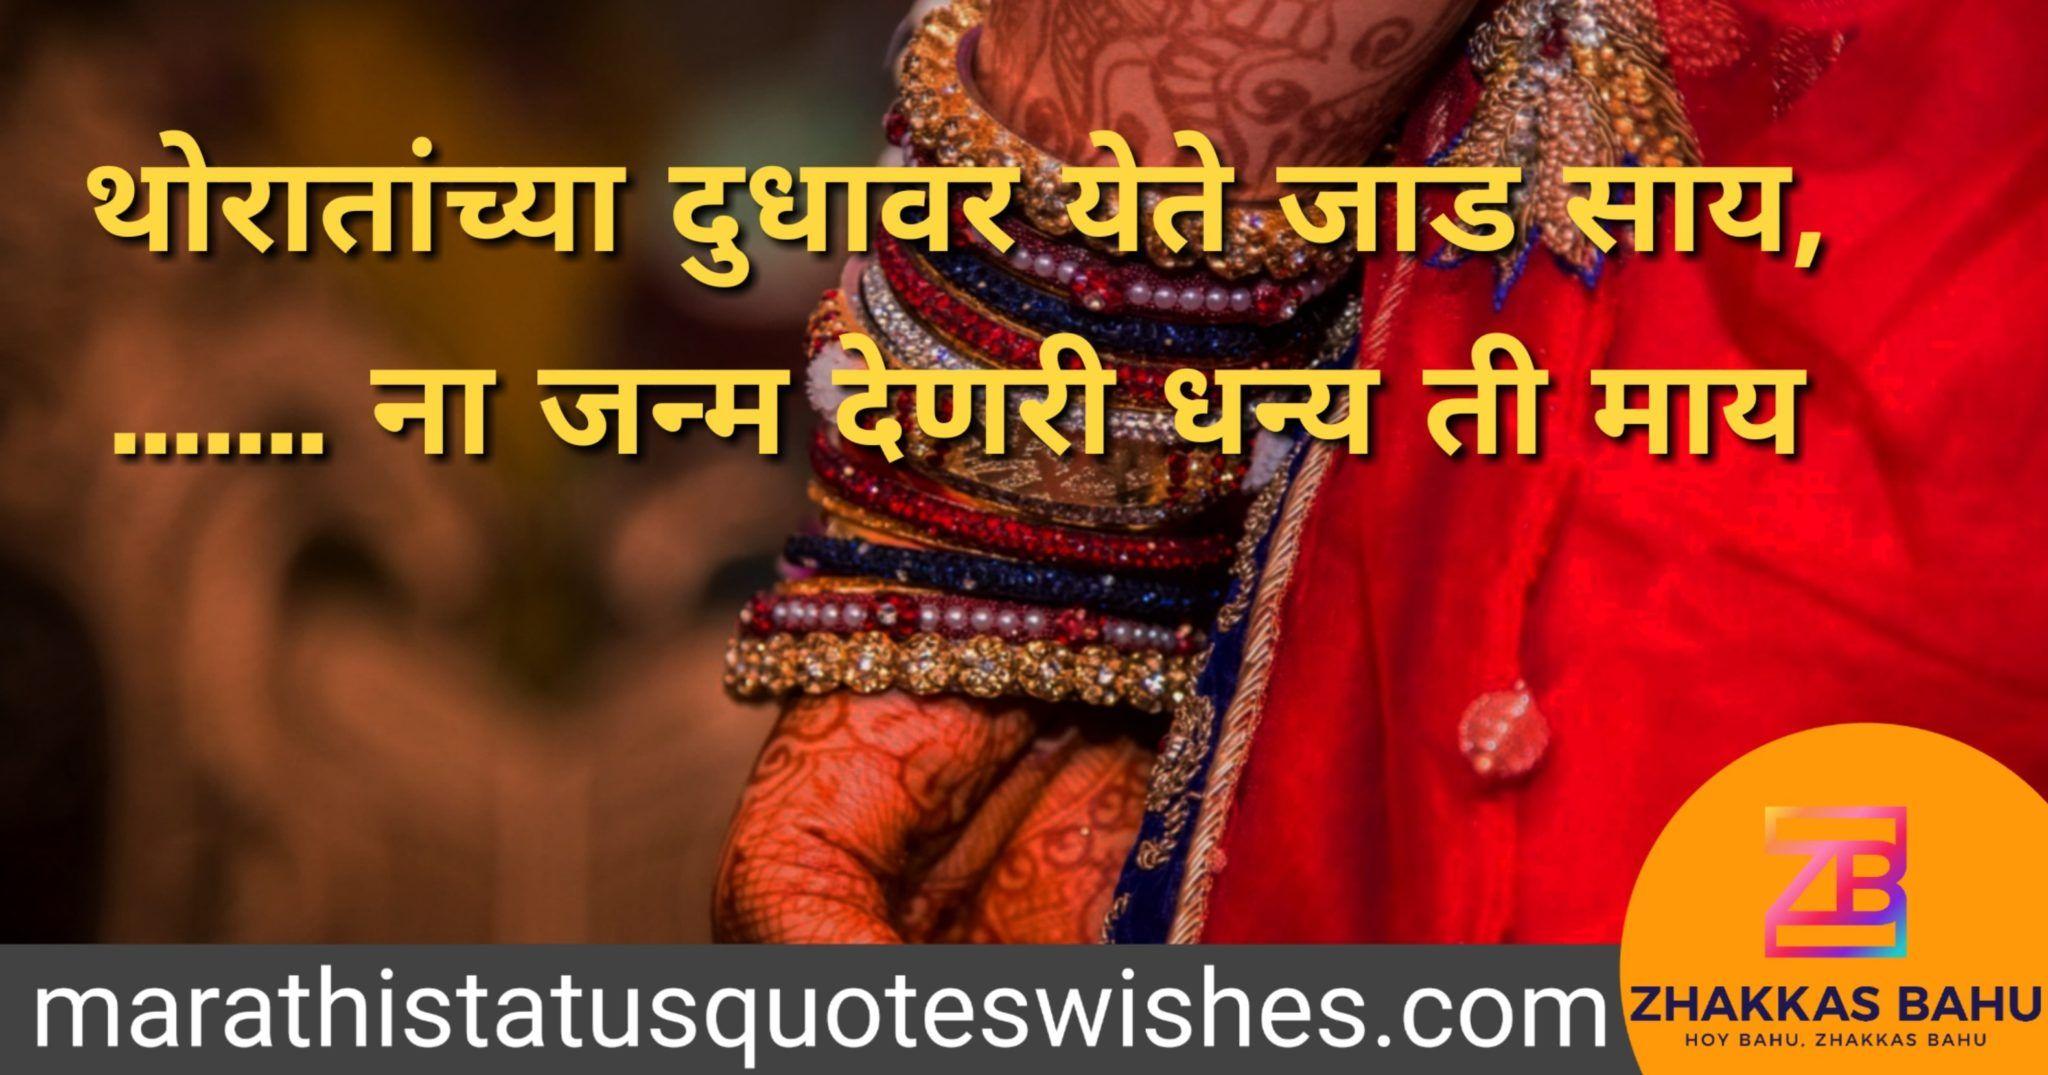 Gujarati dating best ukhane 2021 ☝️ Precious peeps